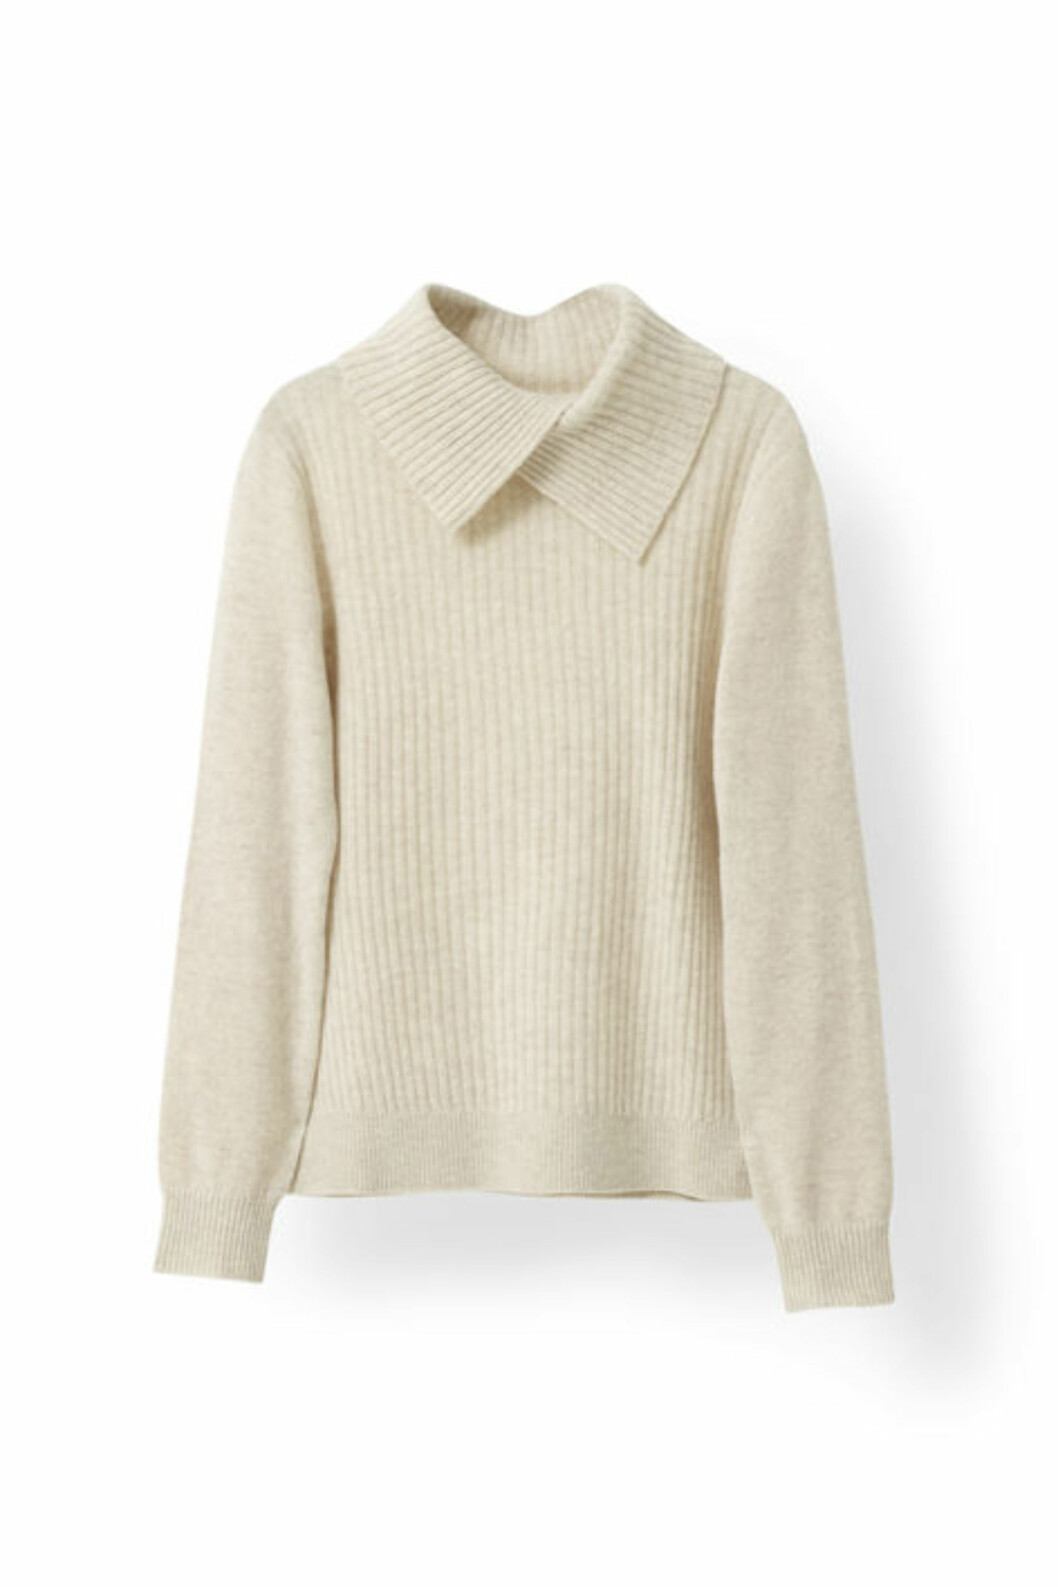 <strong>Strikkagenser fra Ganni | kr 1599 | http:</strong>//www.ganni.com/shop/shirts-and-blouses/mercer-knit-rollneck/K0914.html?dwvar_K0914_color=Vanilla%20Ice%20Melange#start=43